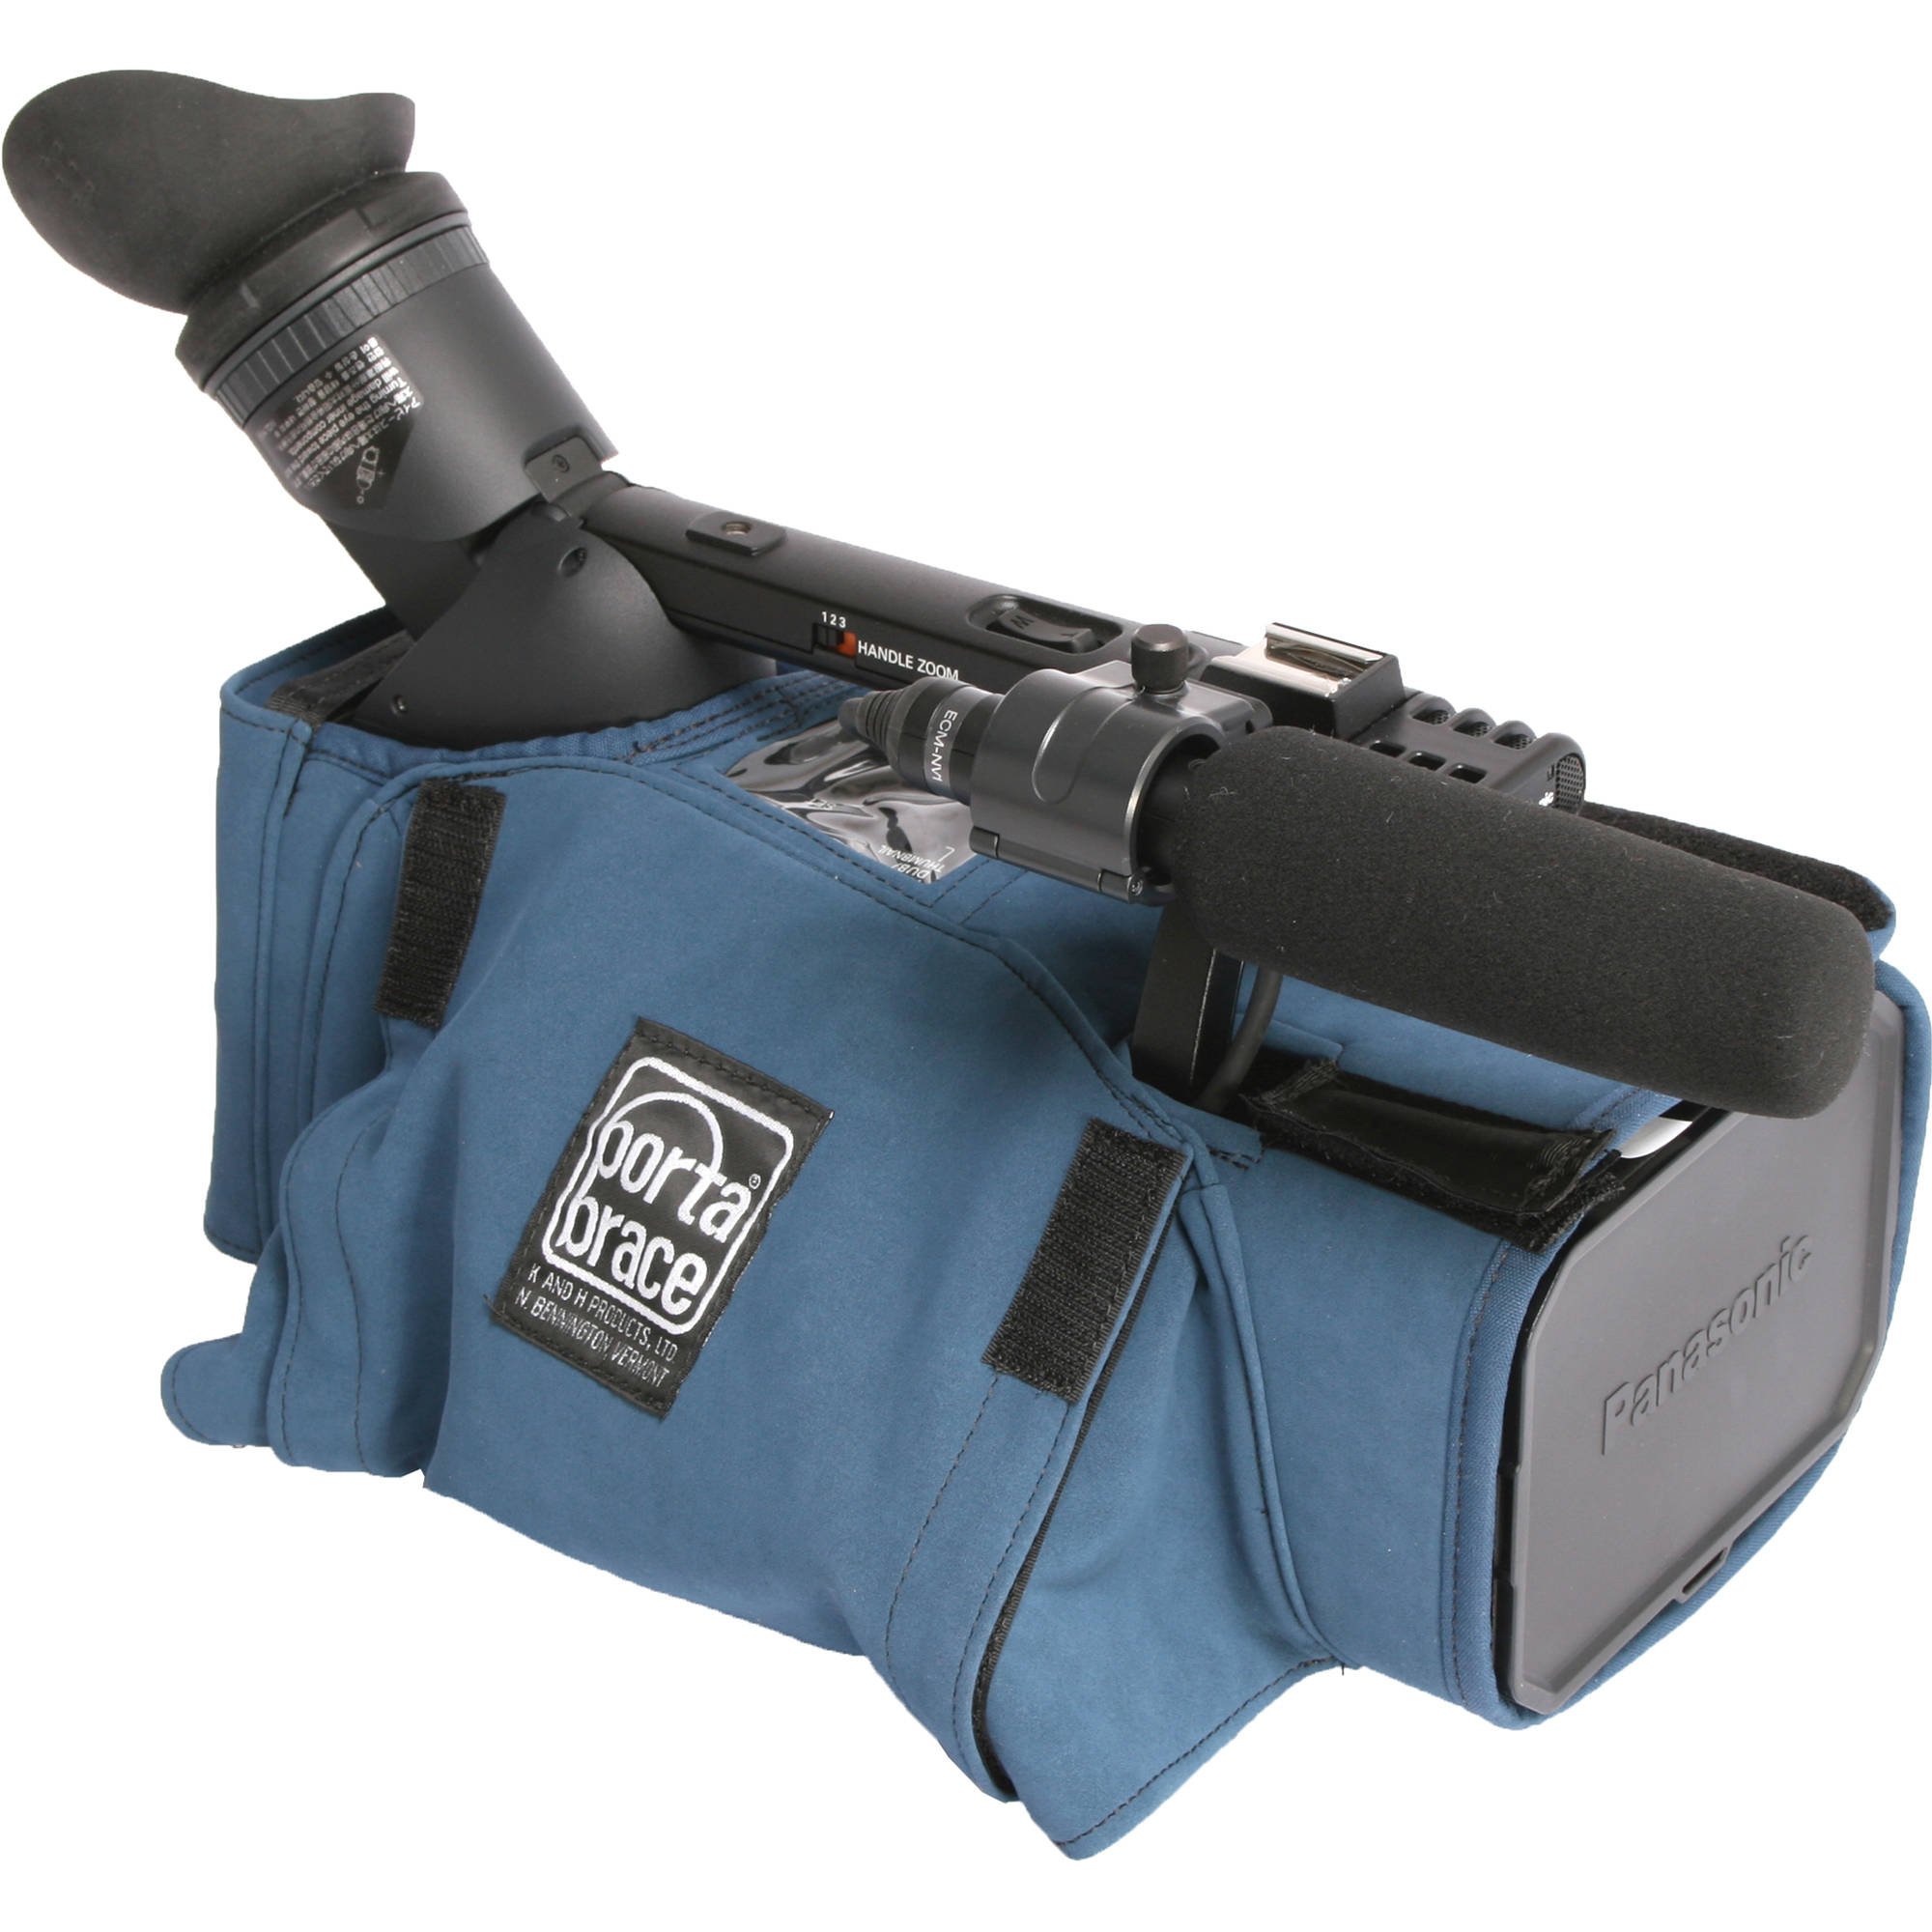 Portabrace CBA-HMC150 Camera Body Armor Mini Camera Case (Blue)